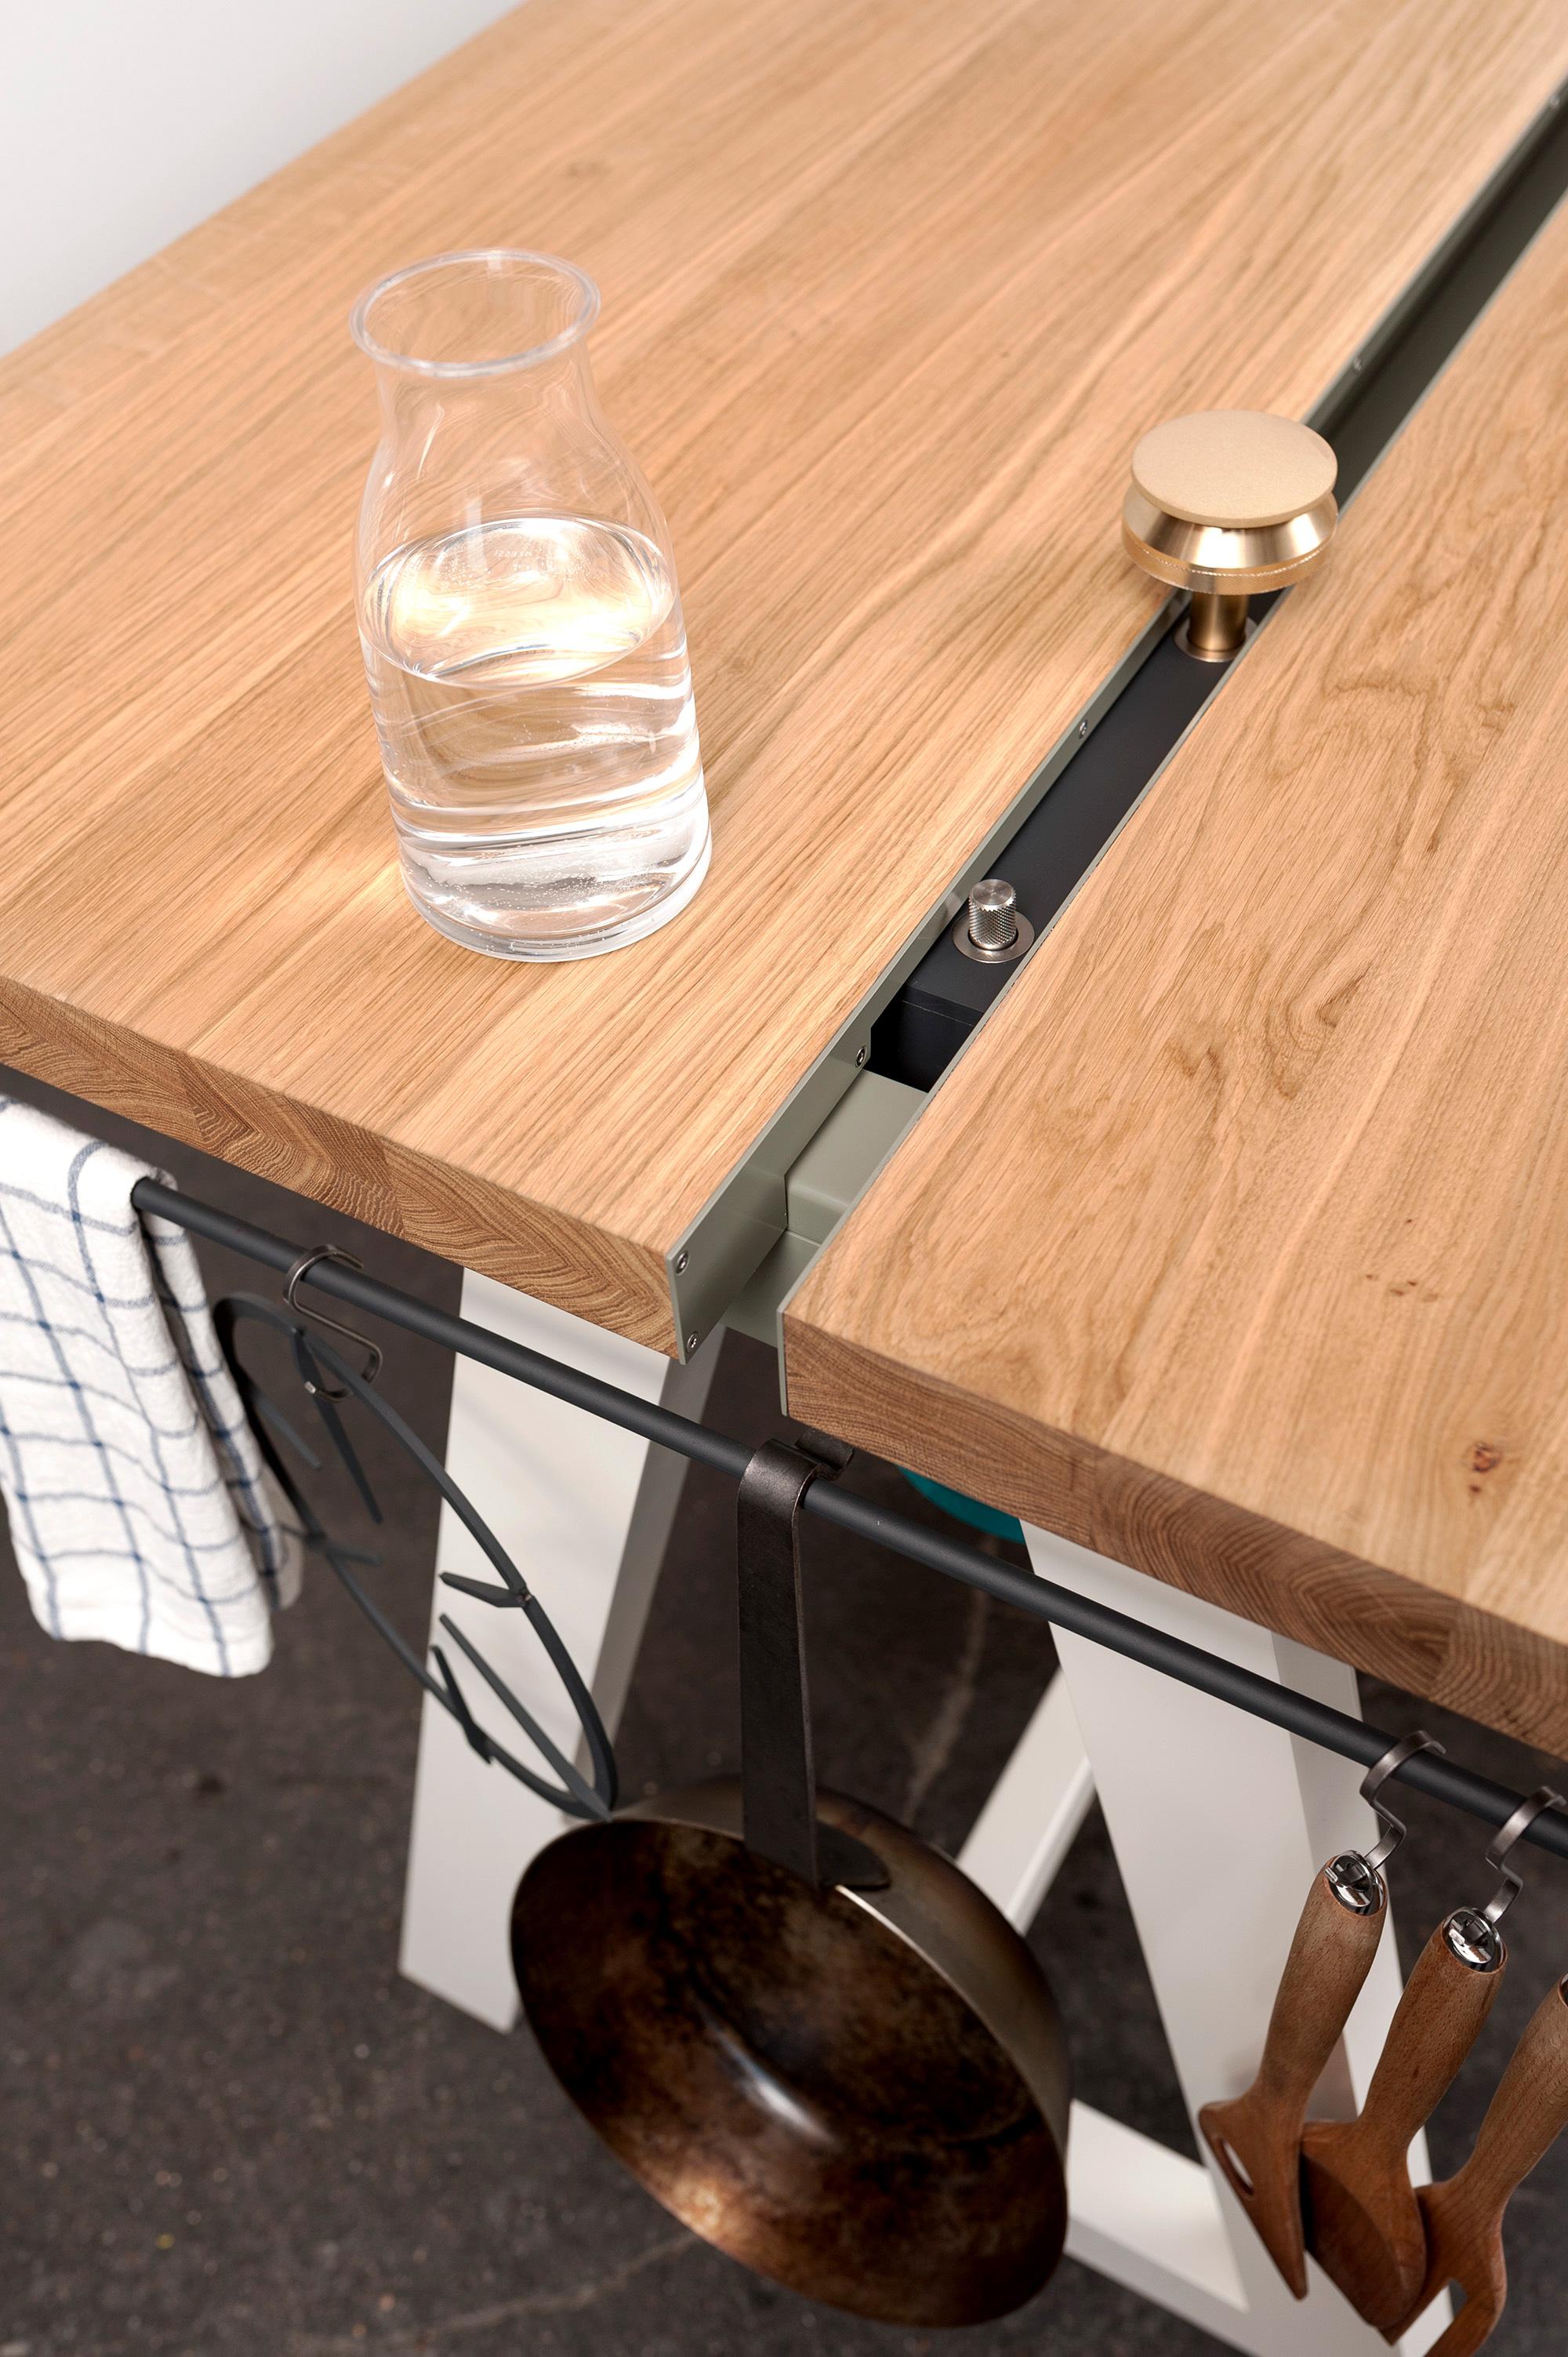 Studio-MoritzPutzier_The-Cooking-Table-10.jpg